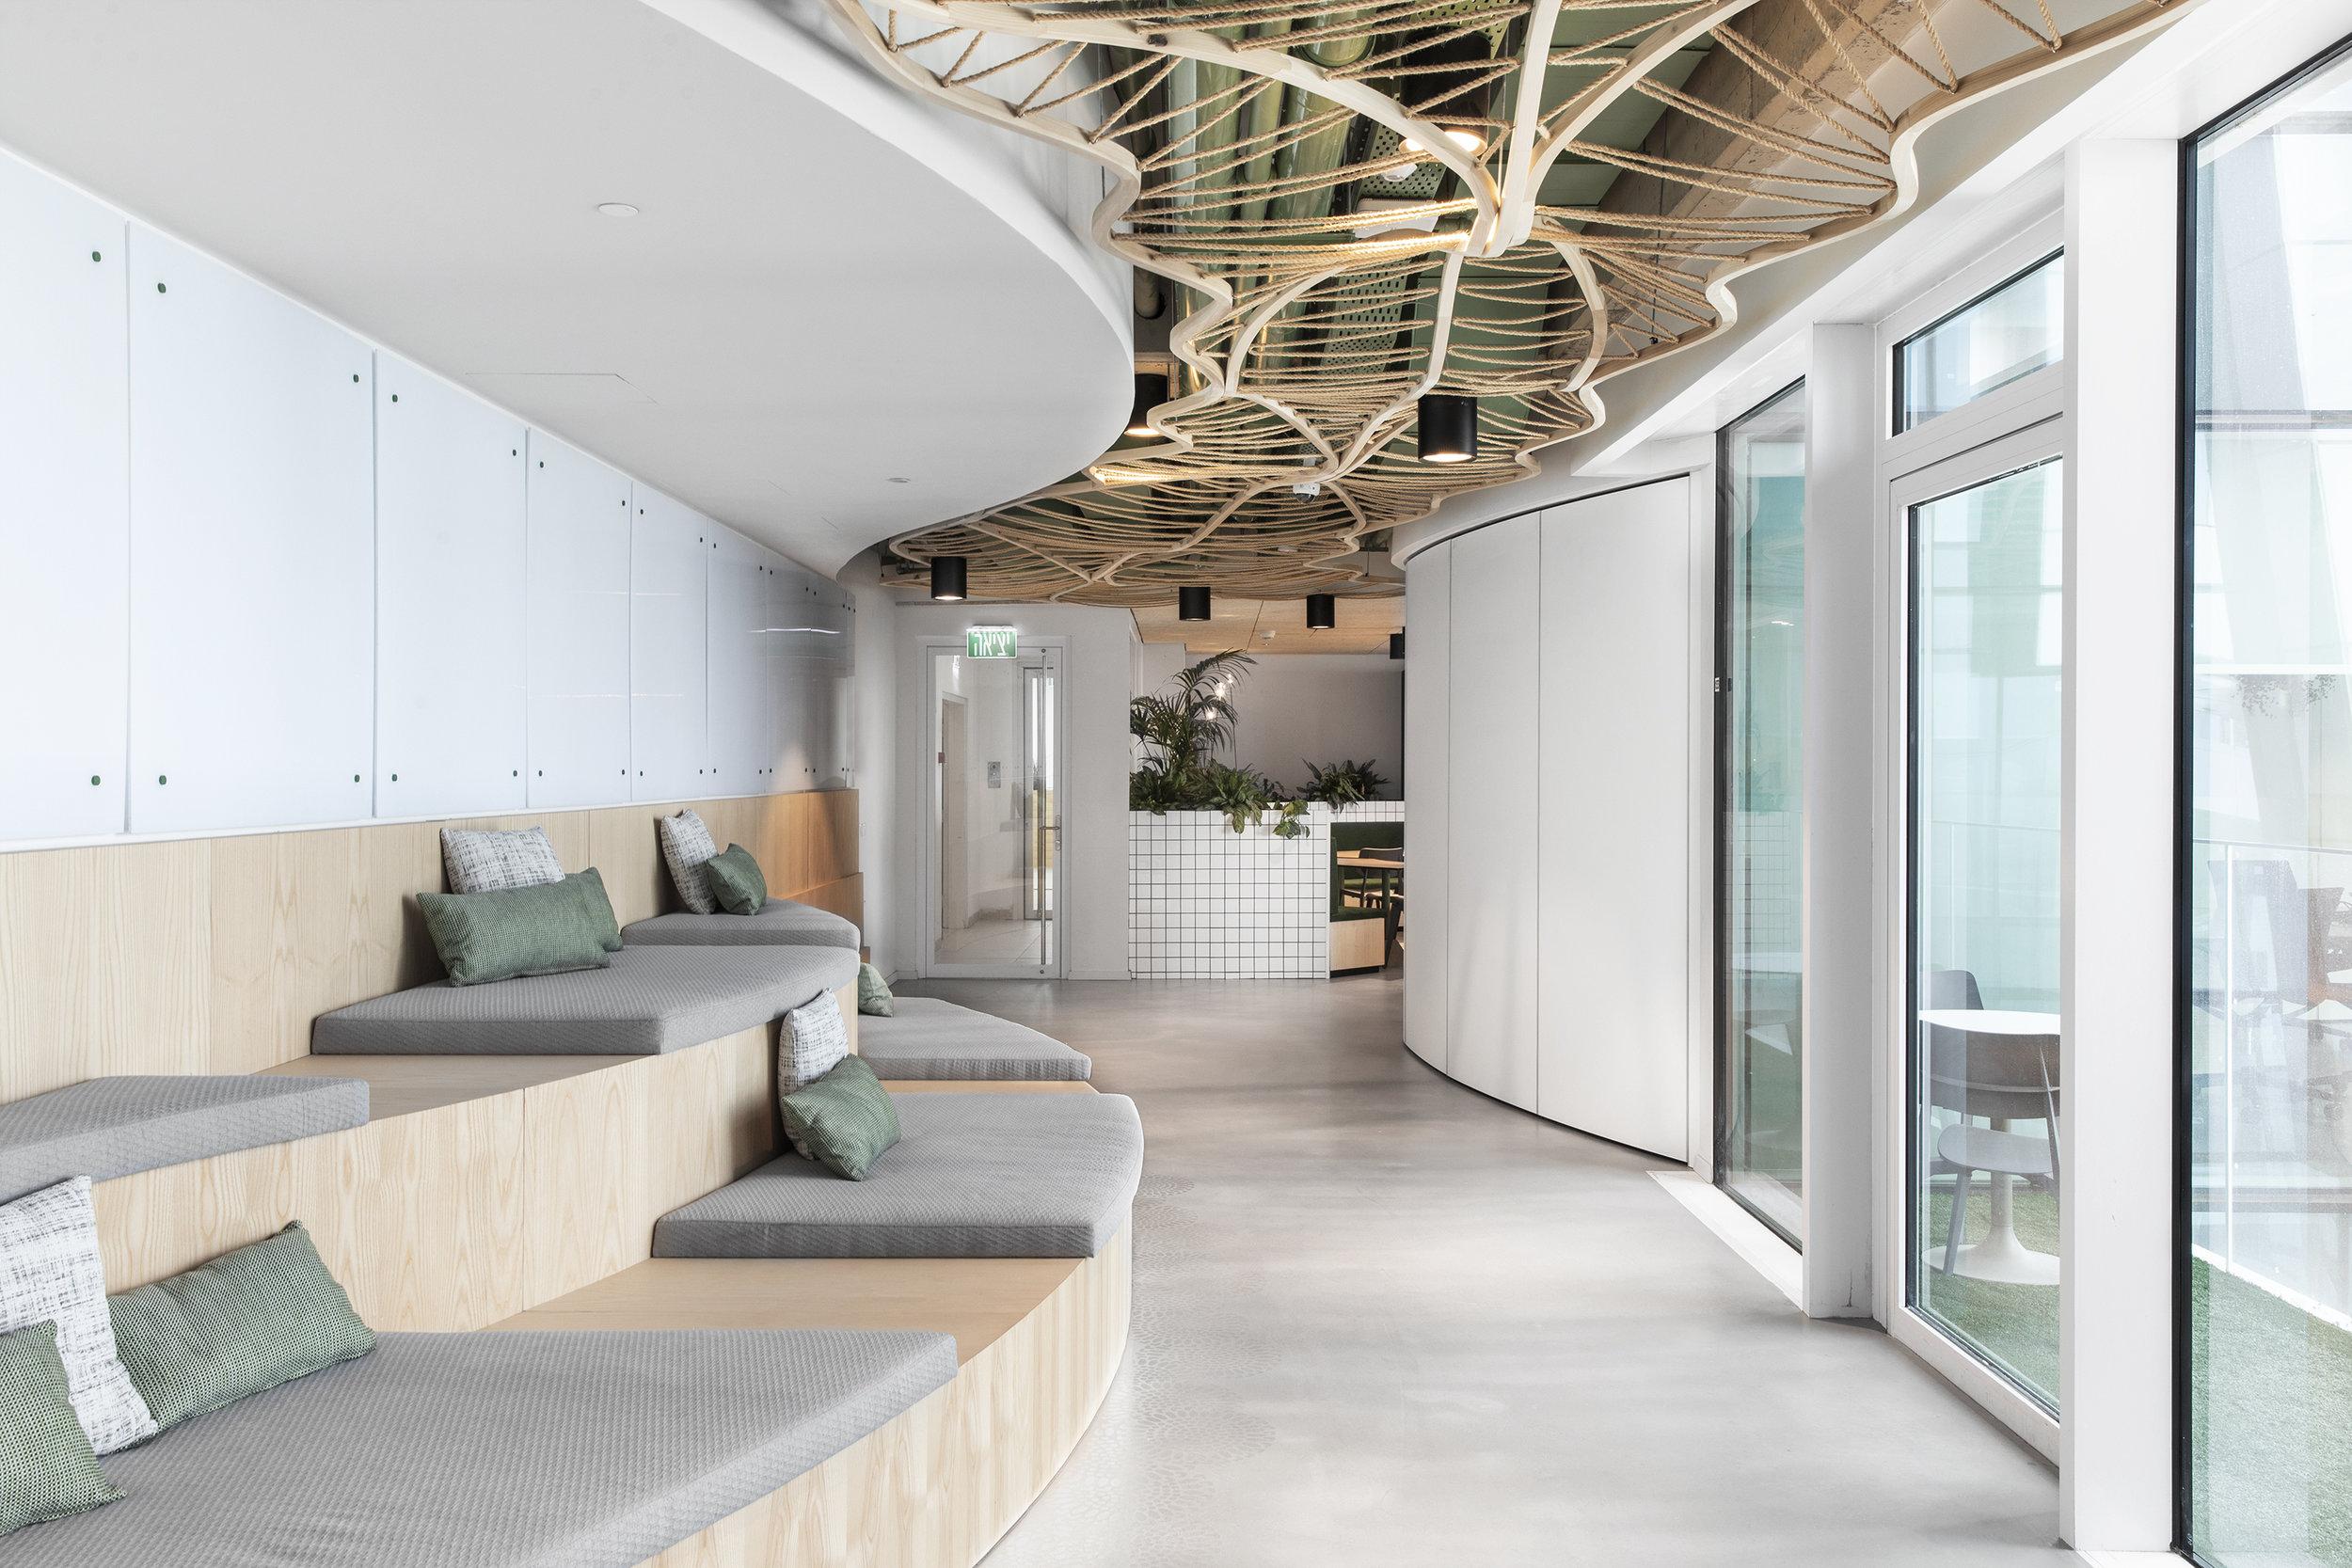 HINNOMAN - ROY DAVID ARCHTECTURE - STUDIO - סטודיו רואי דוד - אדריכלים (33).jpg